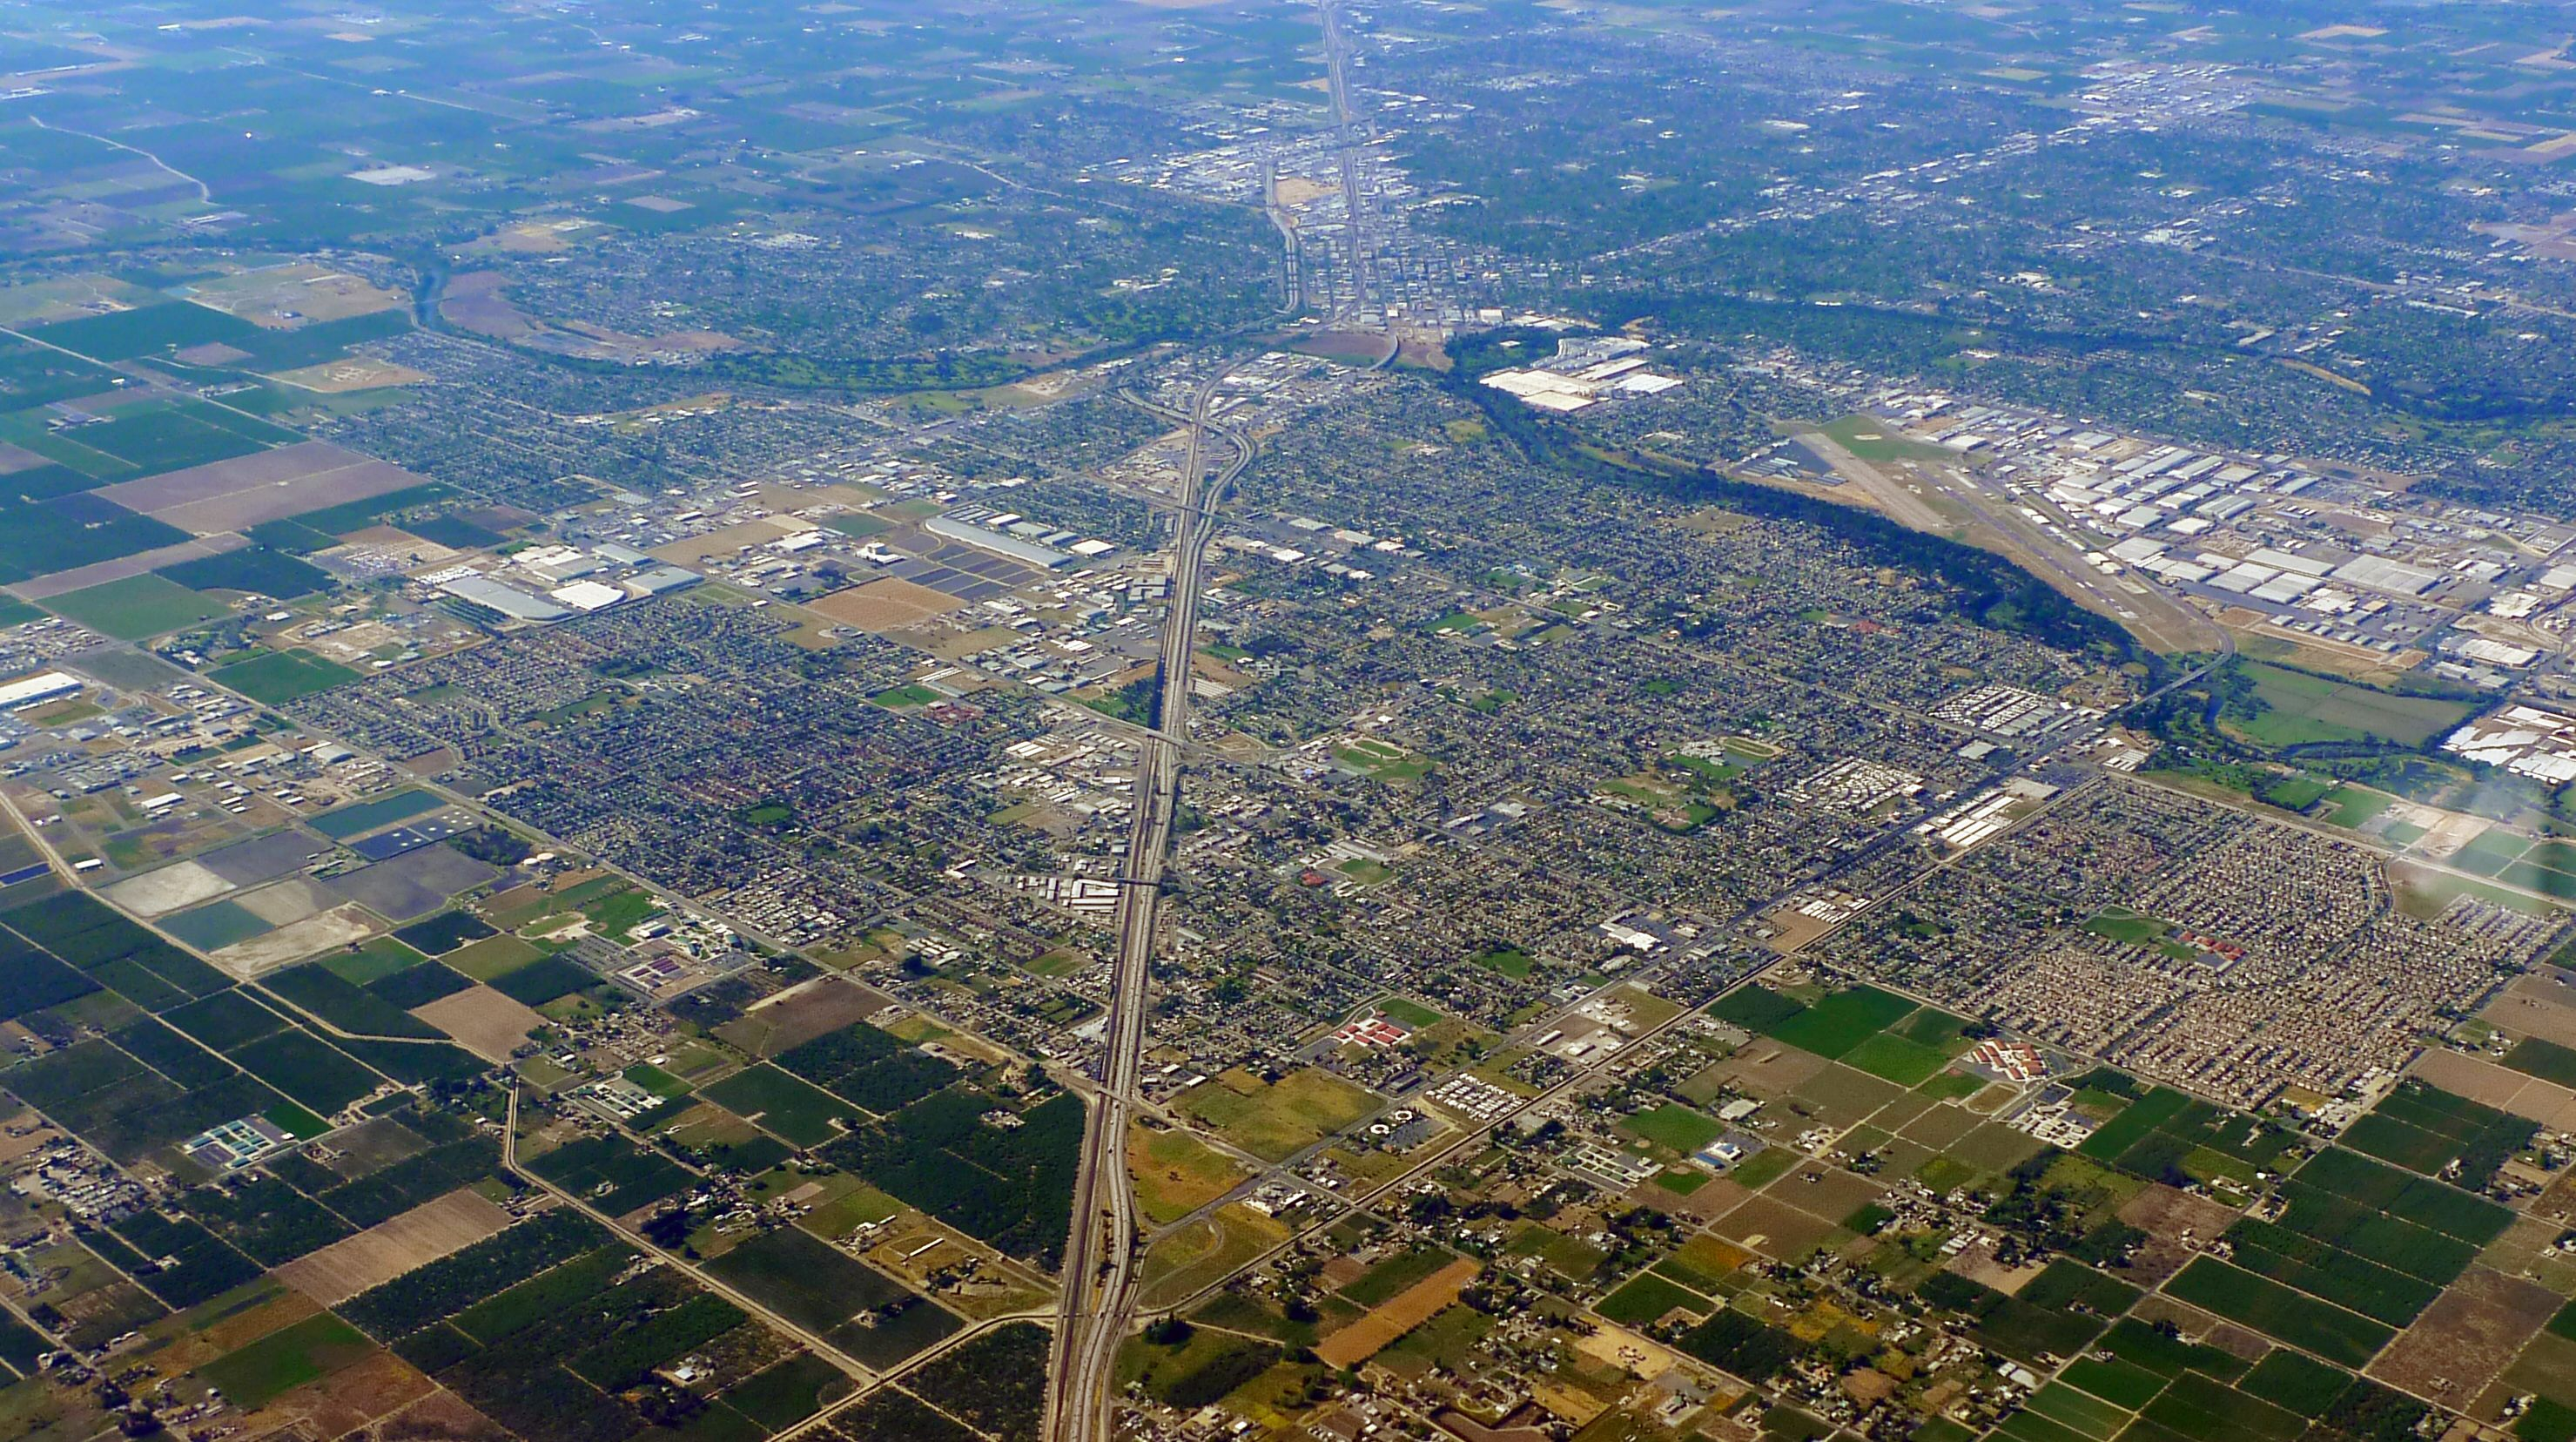 Image Of Macys In Modesto Ca Google Search Modesto City Usa Cities